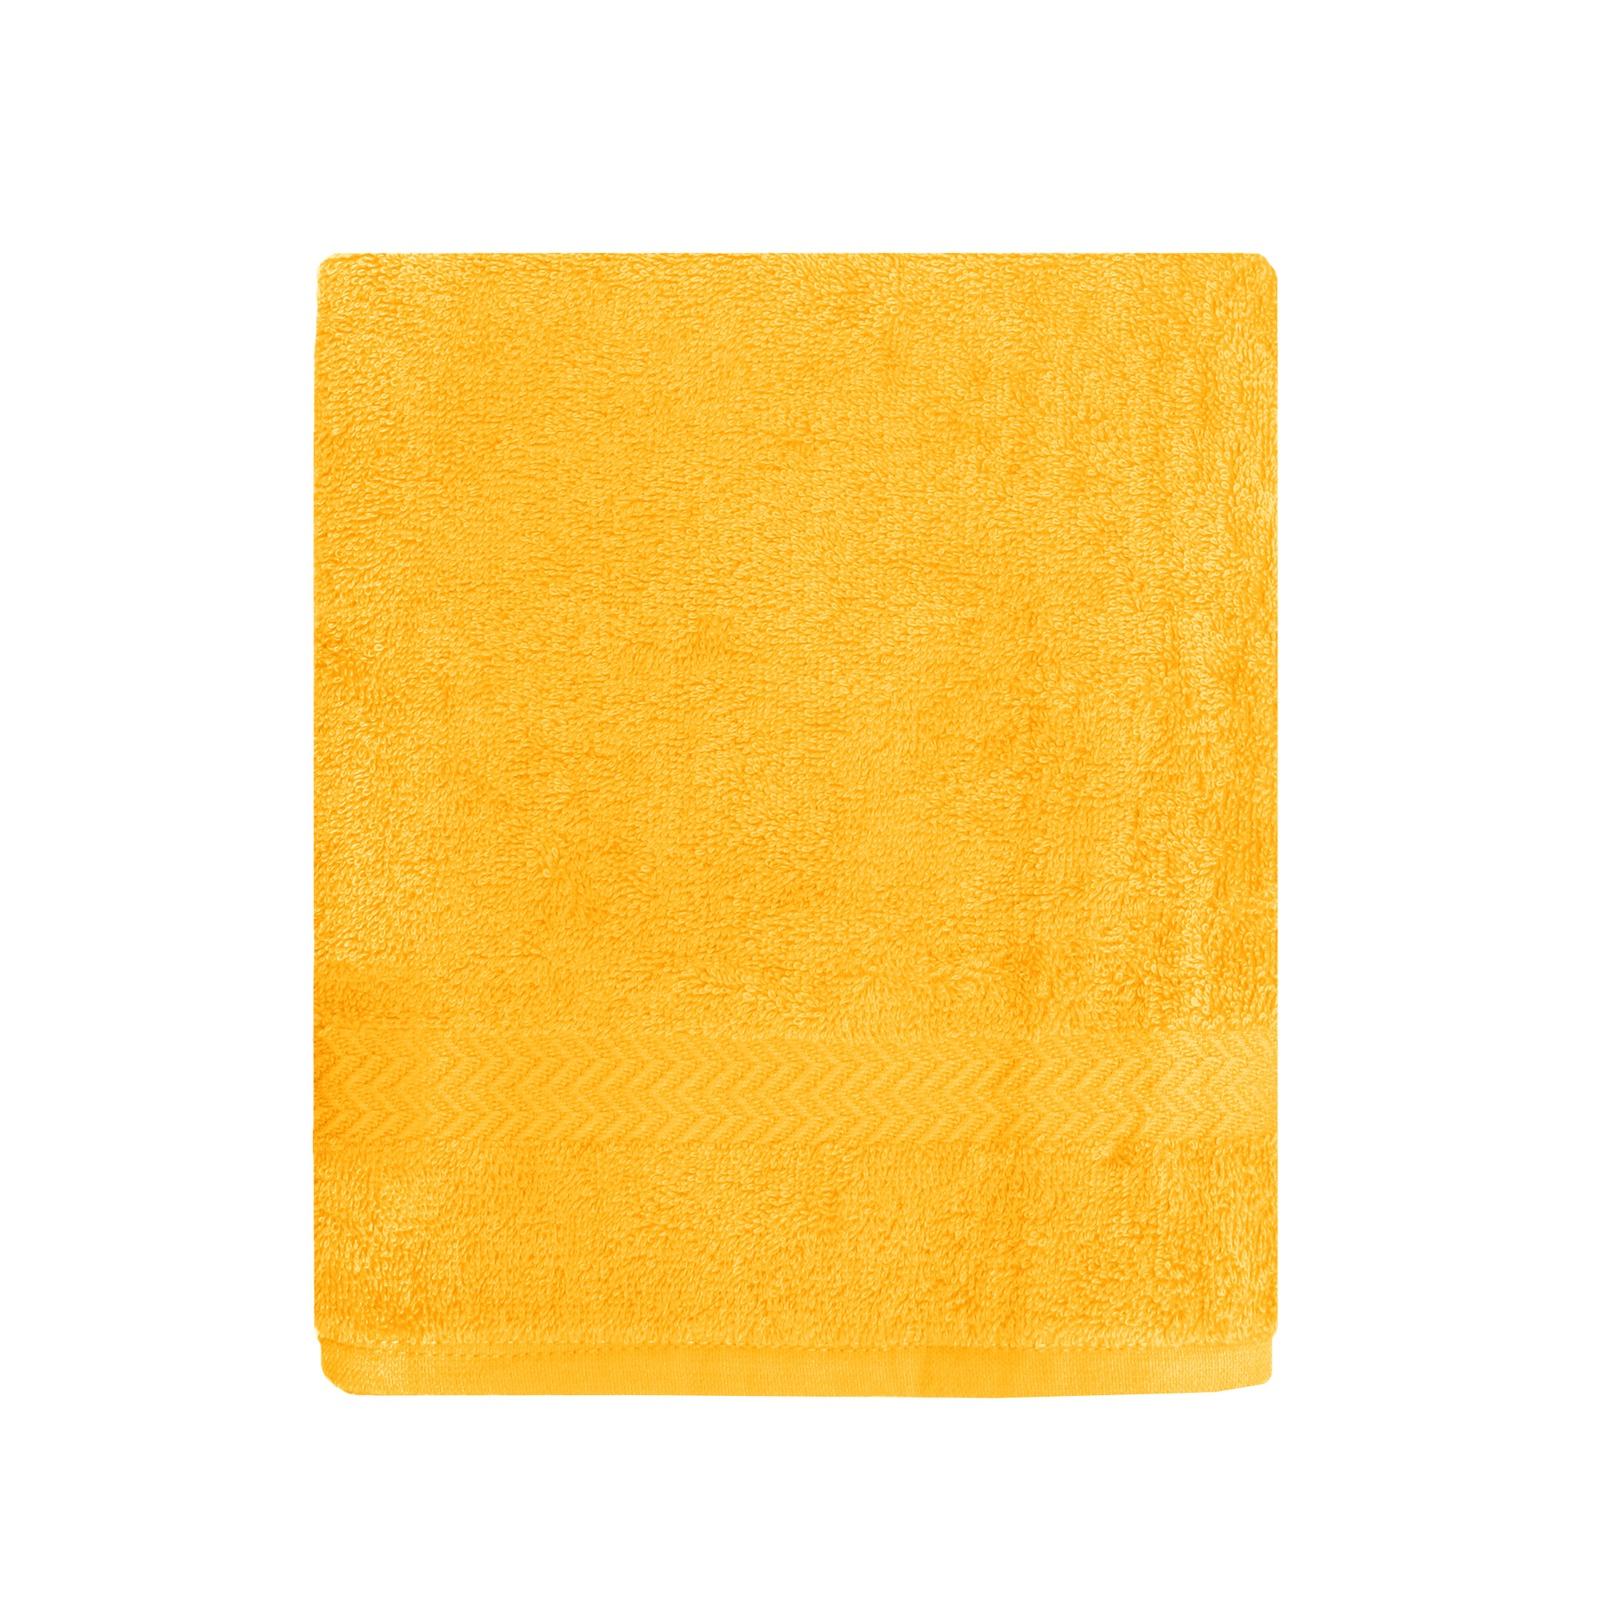 Полотенце банное Bonita Classic, 21011215143, желтый, 70 х 140 см